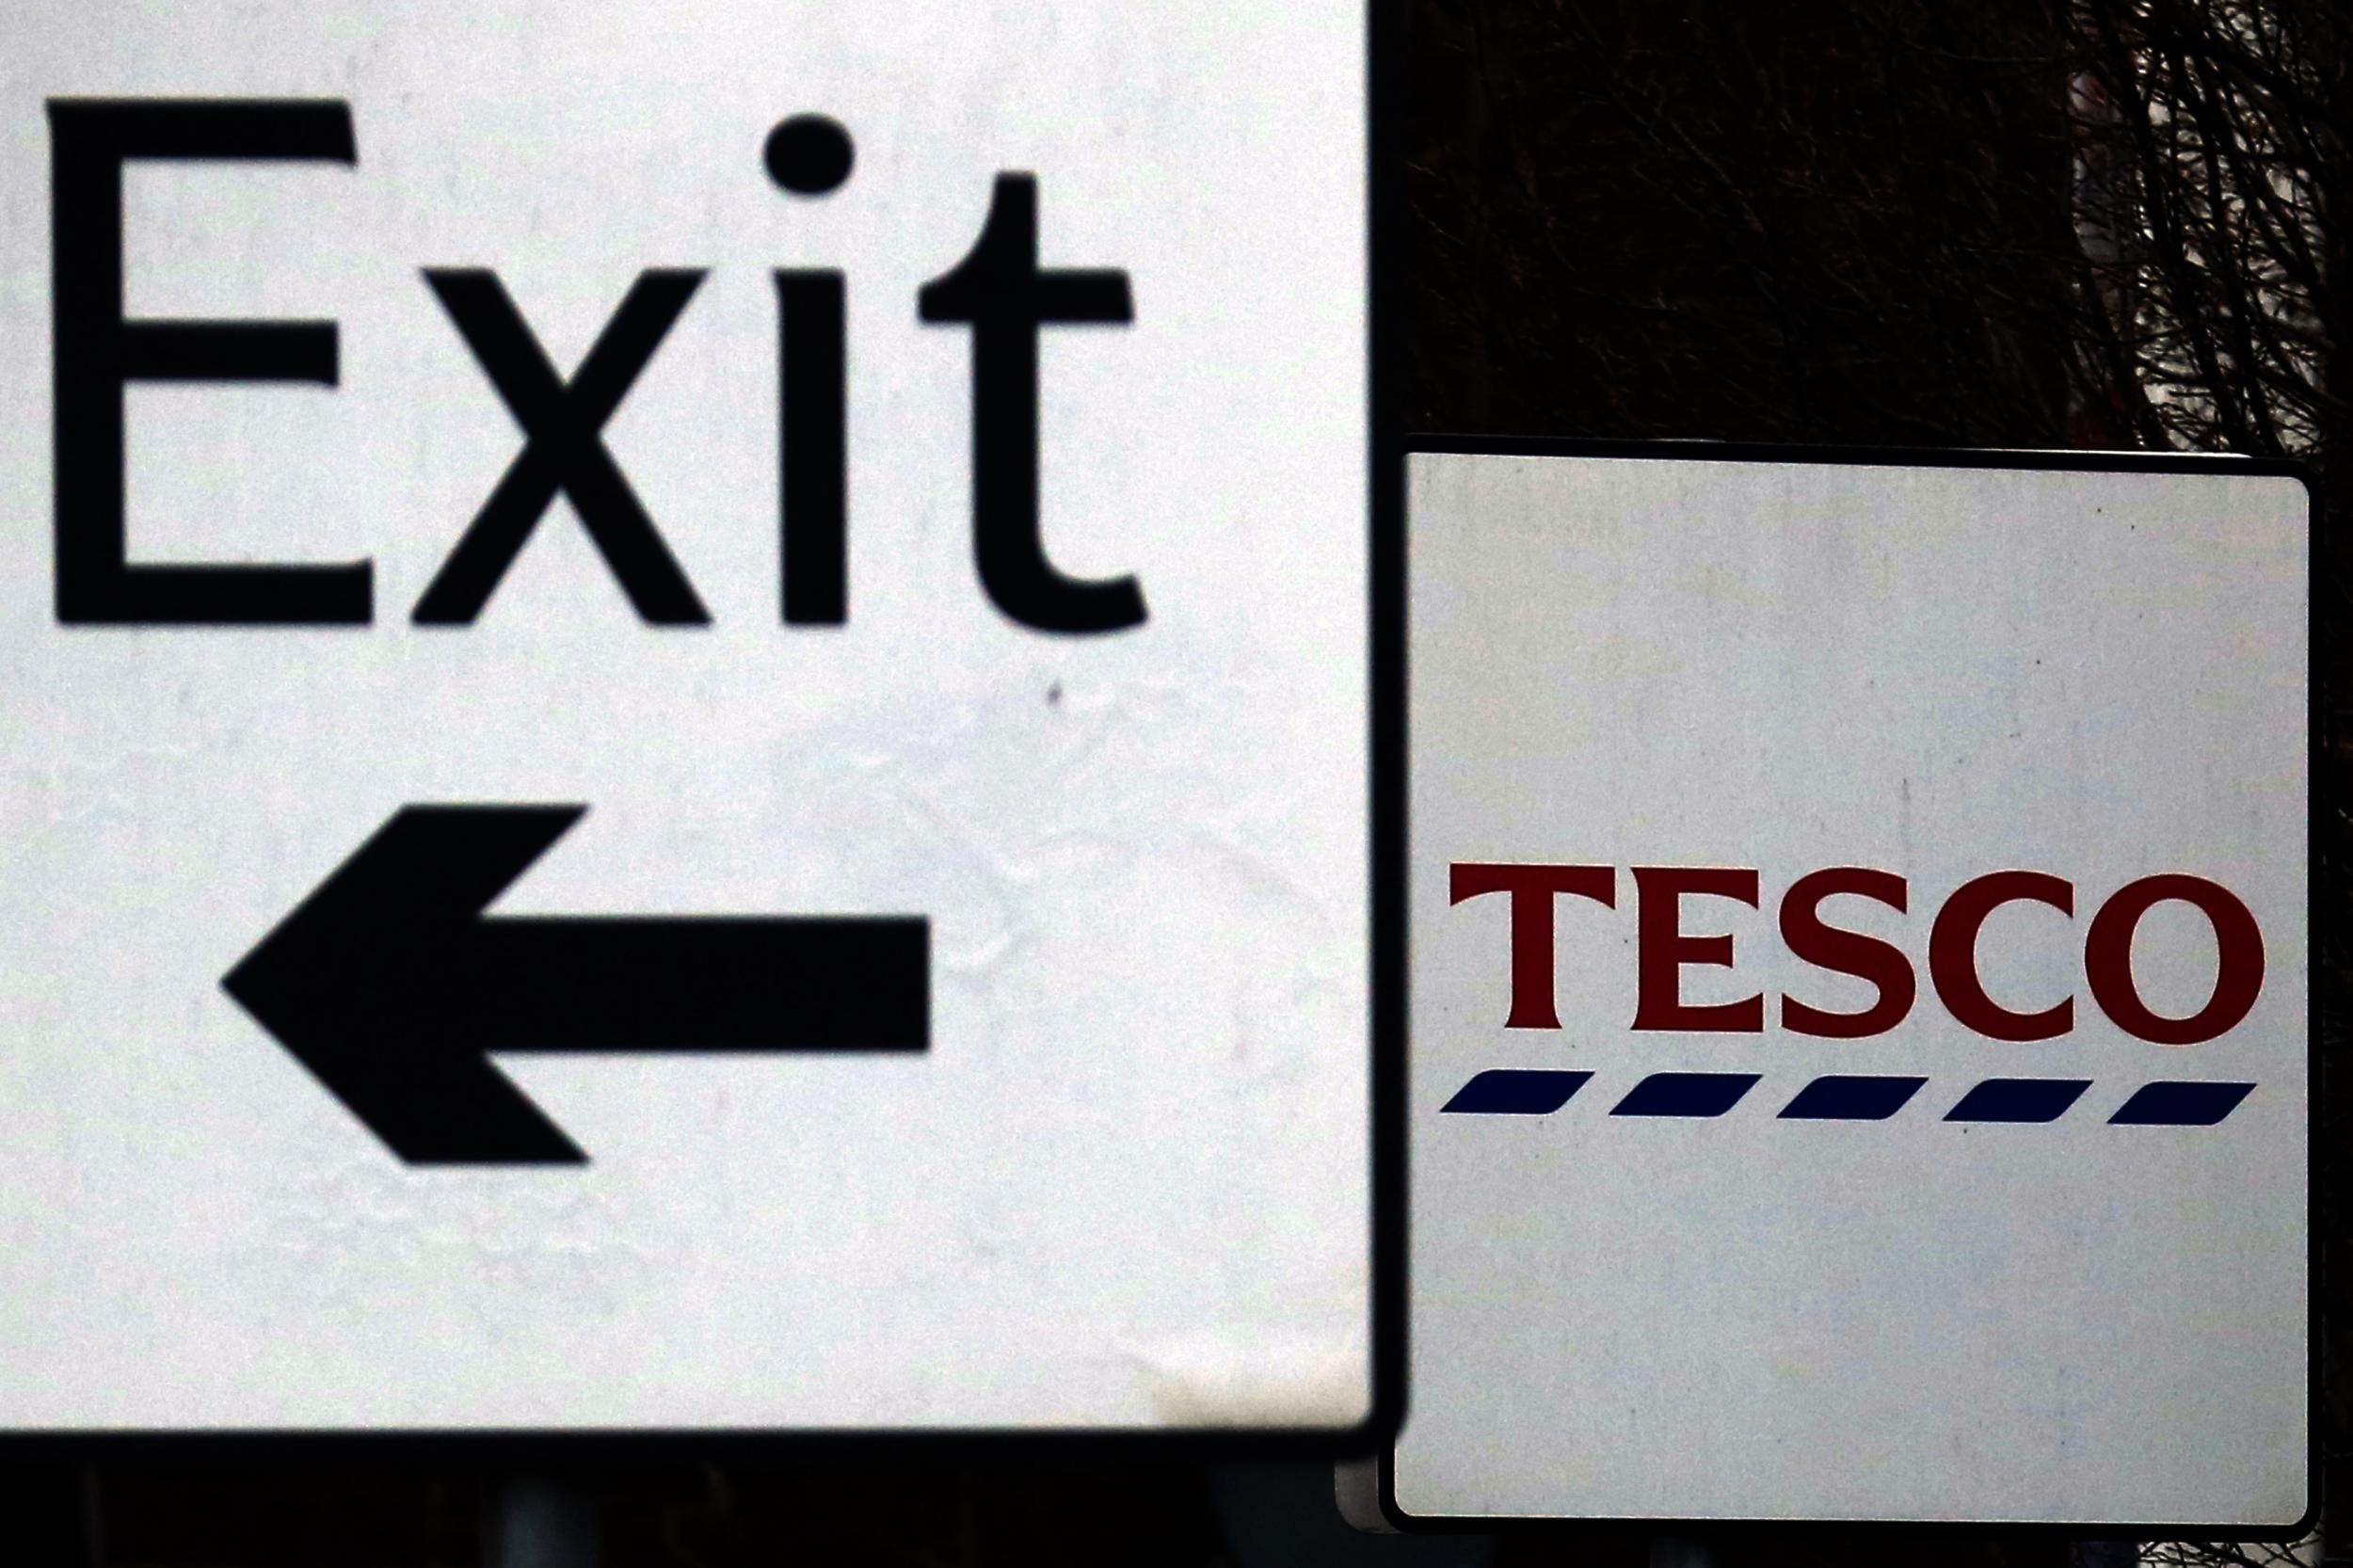 Tesco Shutting Down Loss Making Website Putting Hundreds Of Jobs At